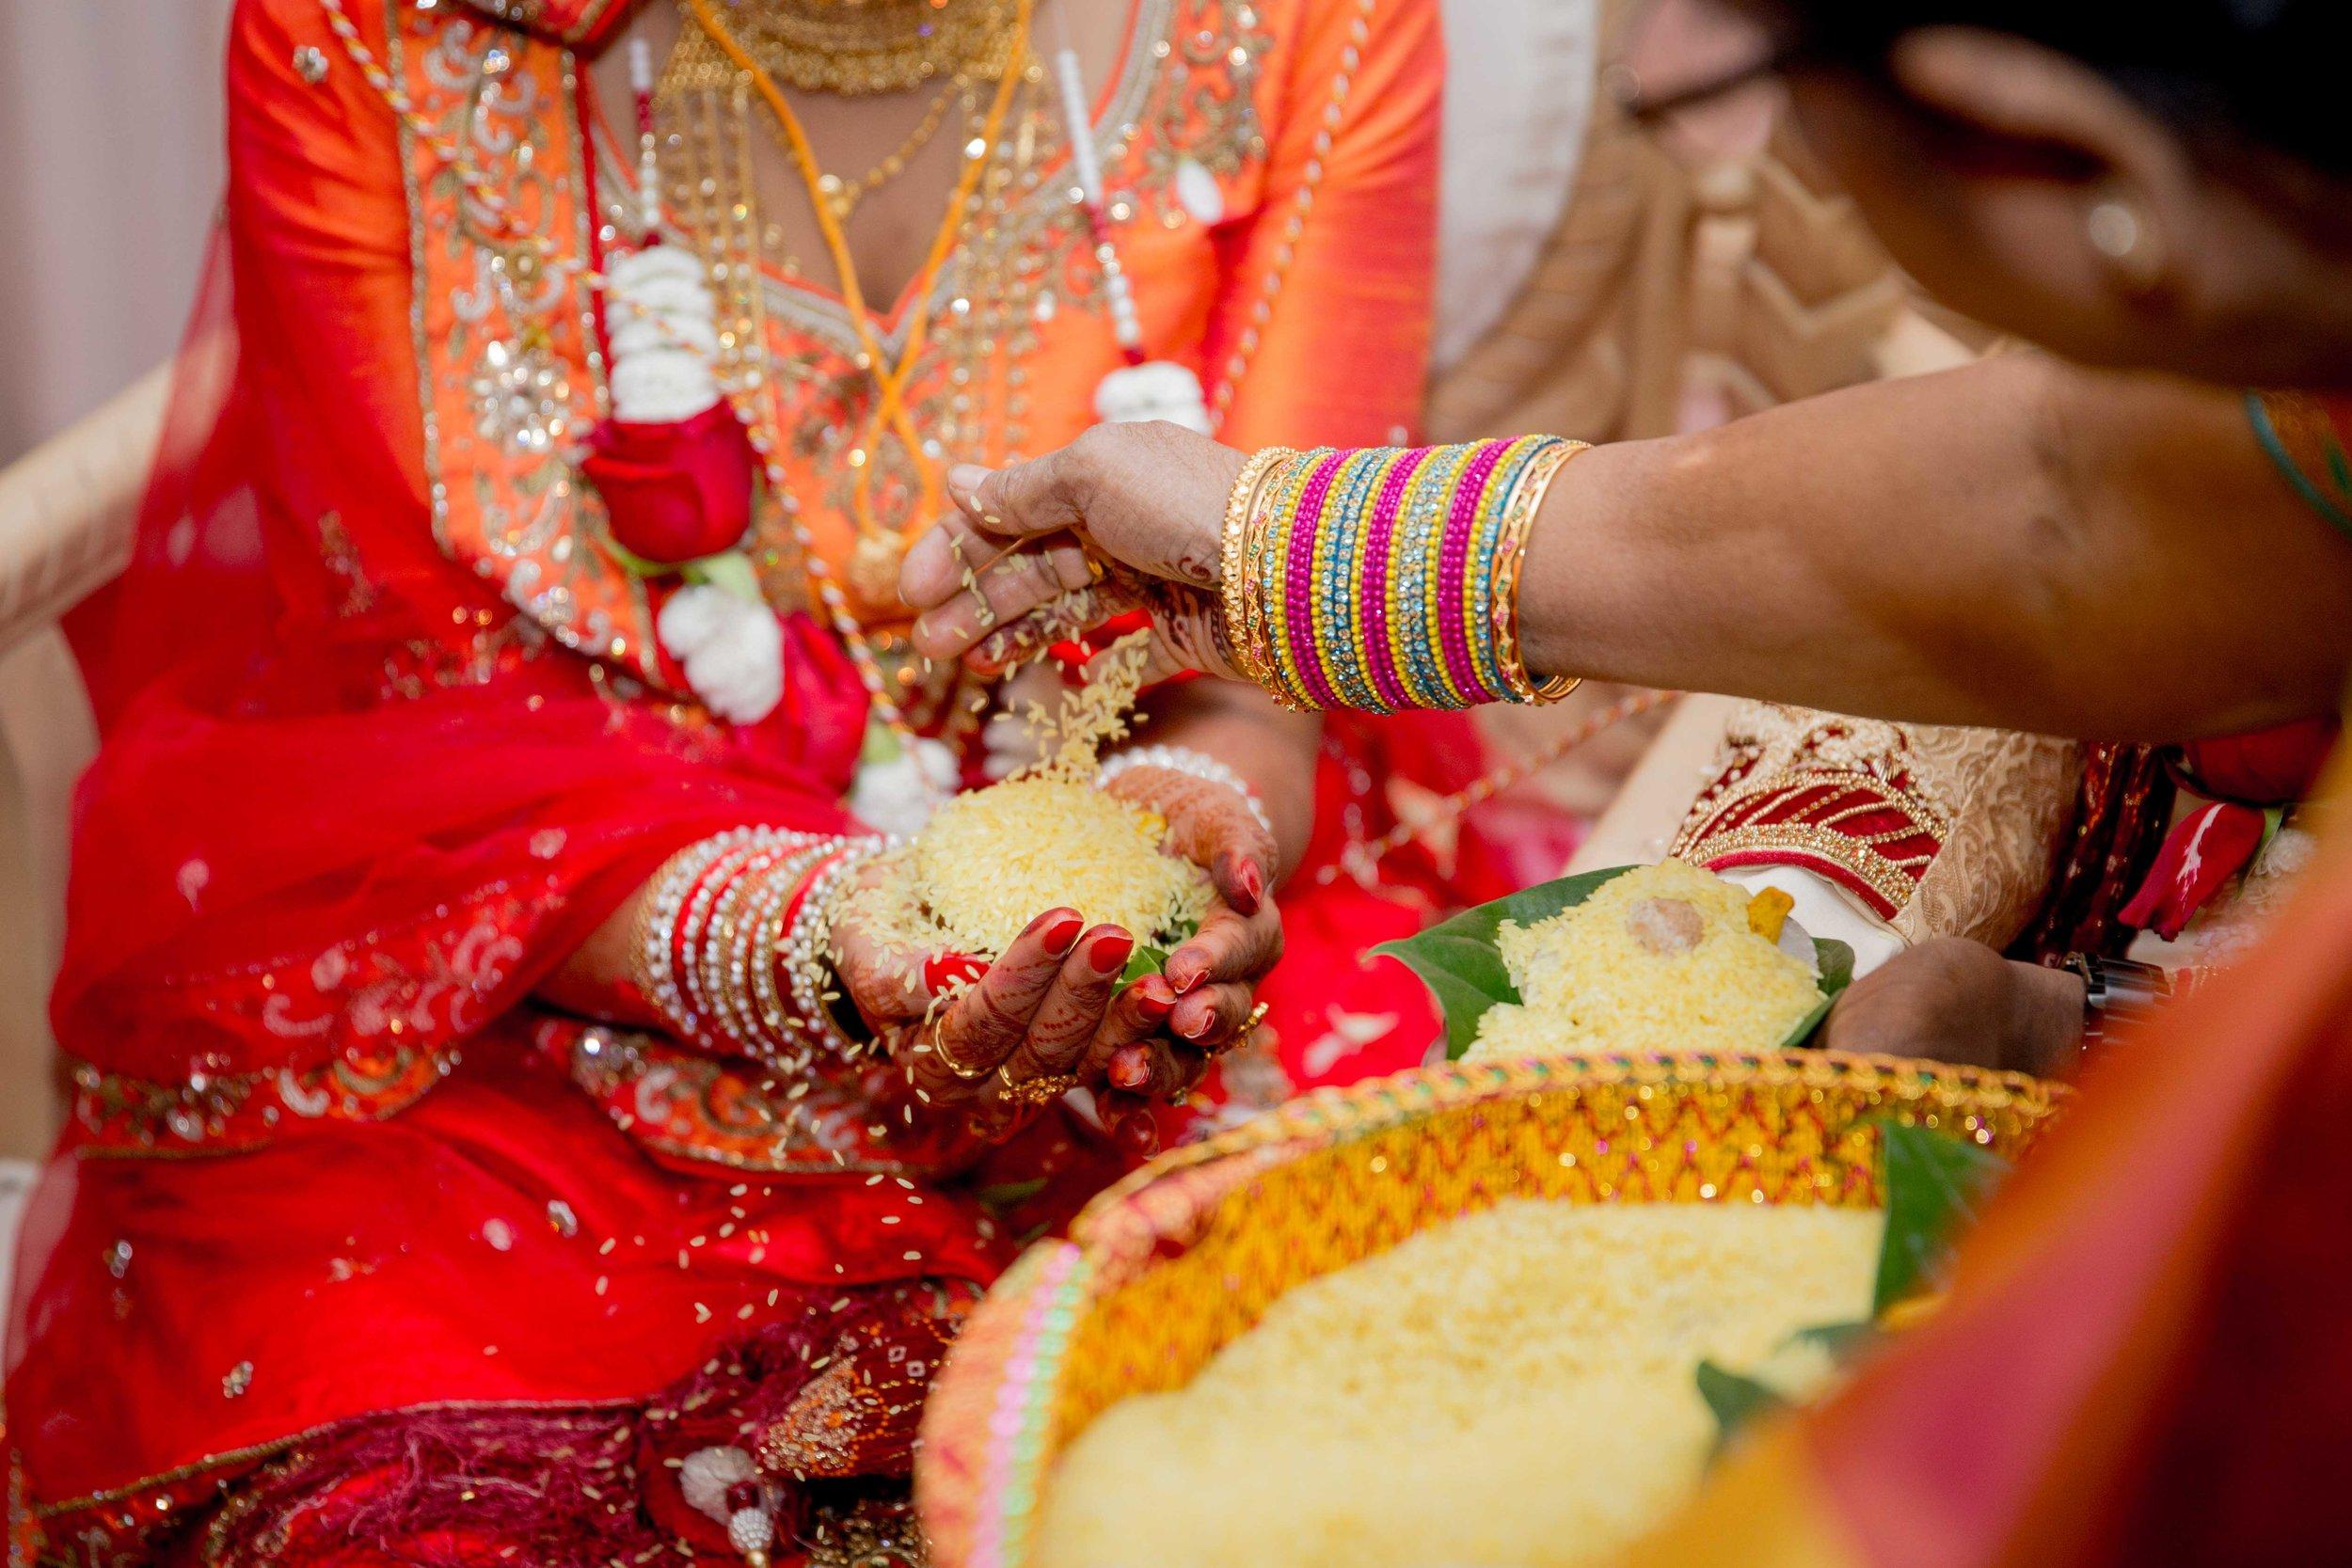 premier-banquetting-london-Hindu-asian-wedding-photographer-natalia-smith-photography-36.jpg